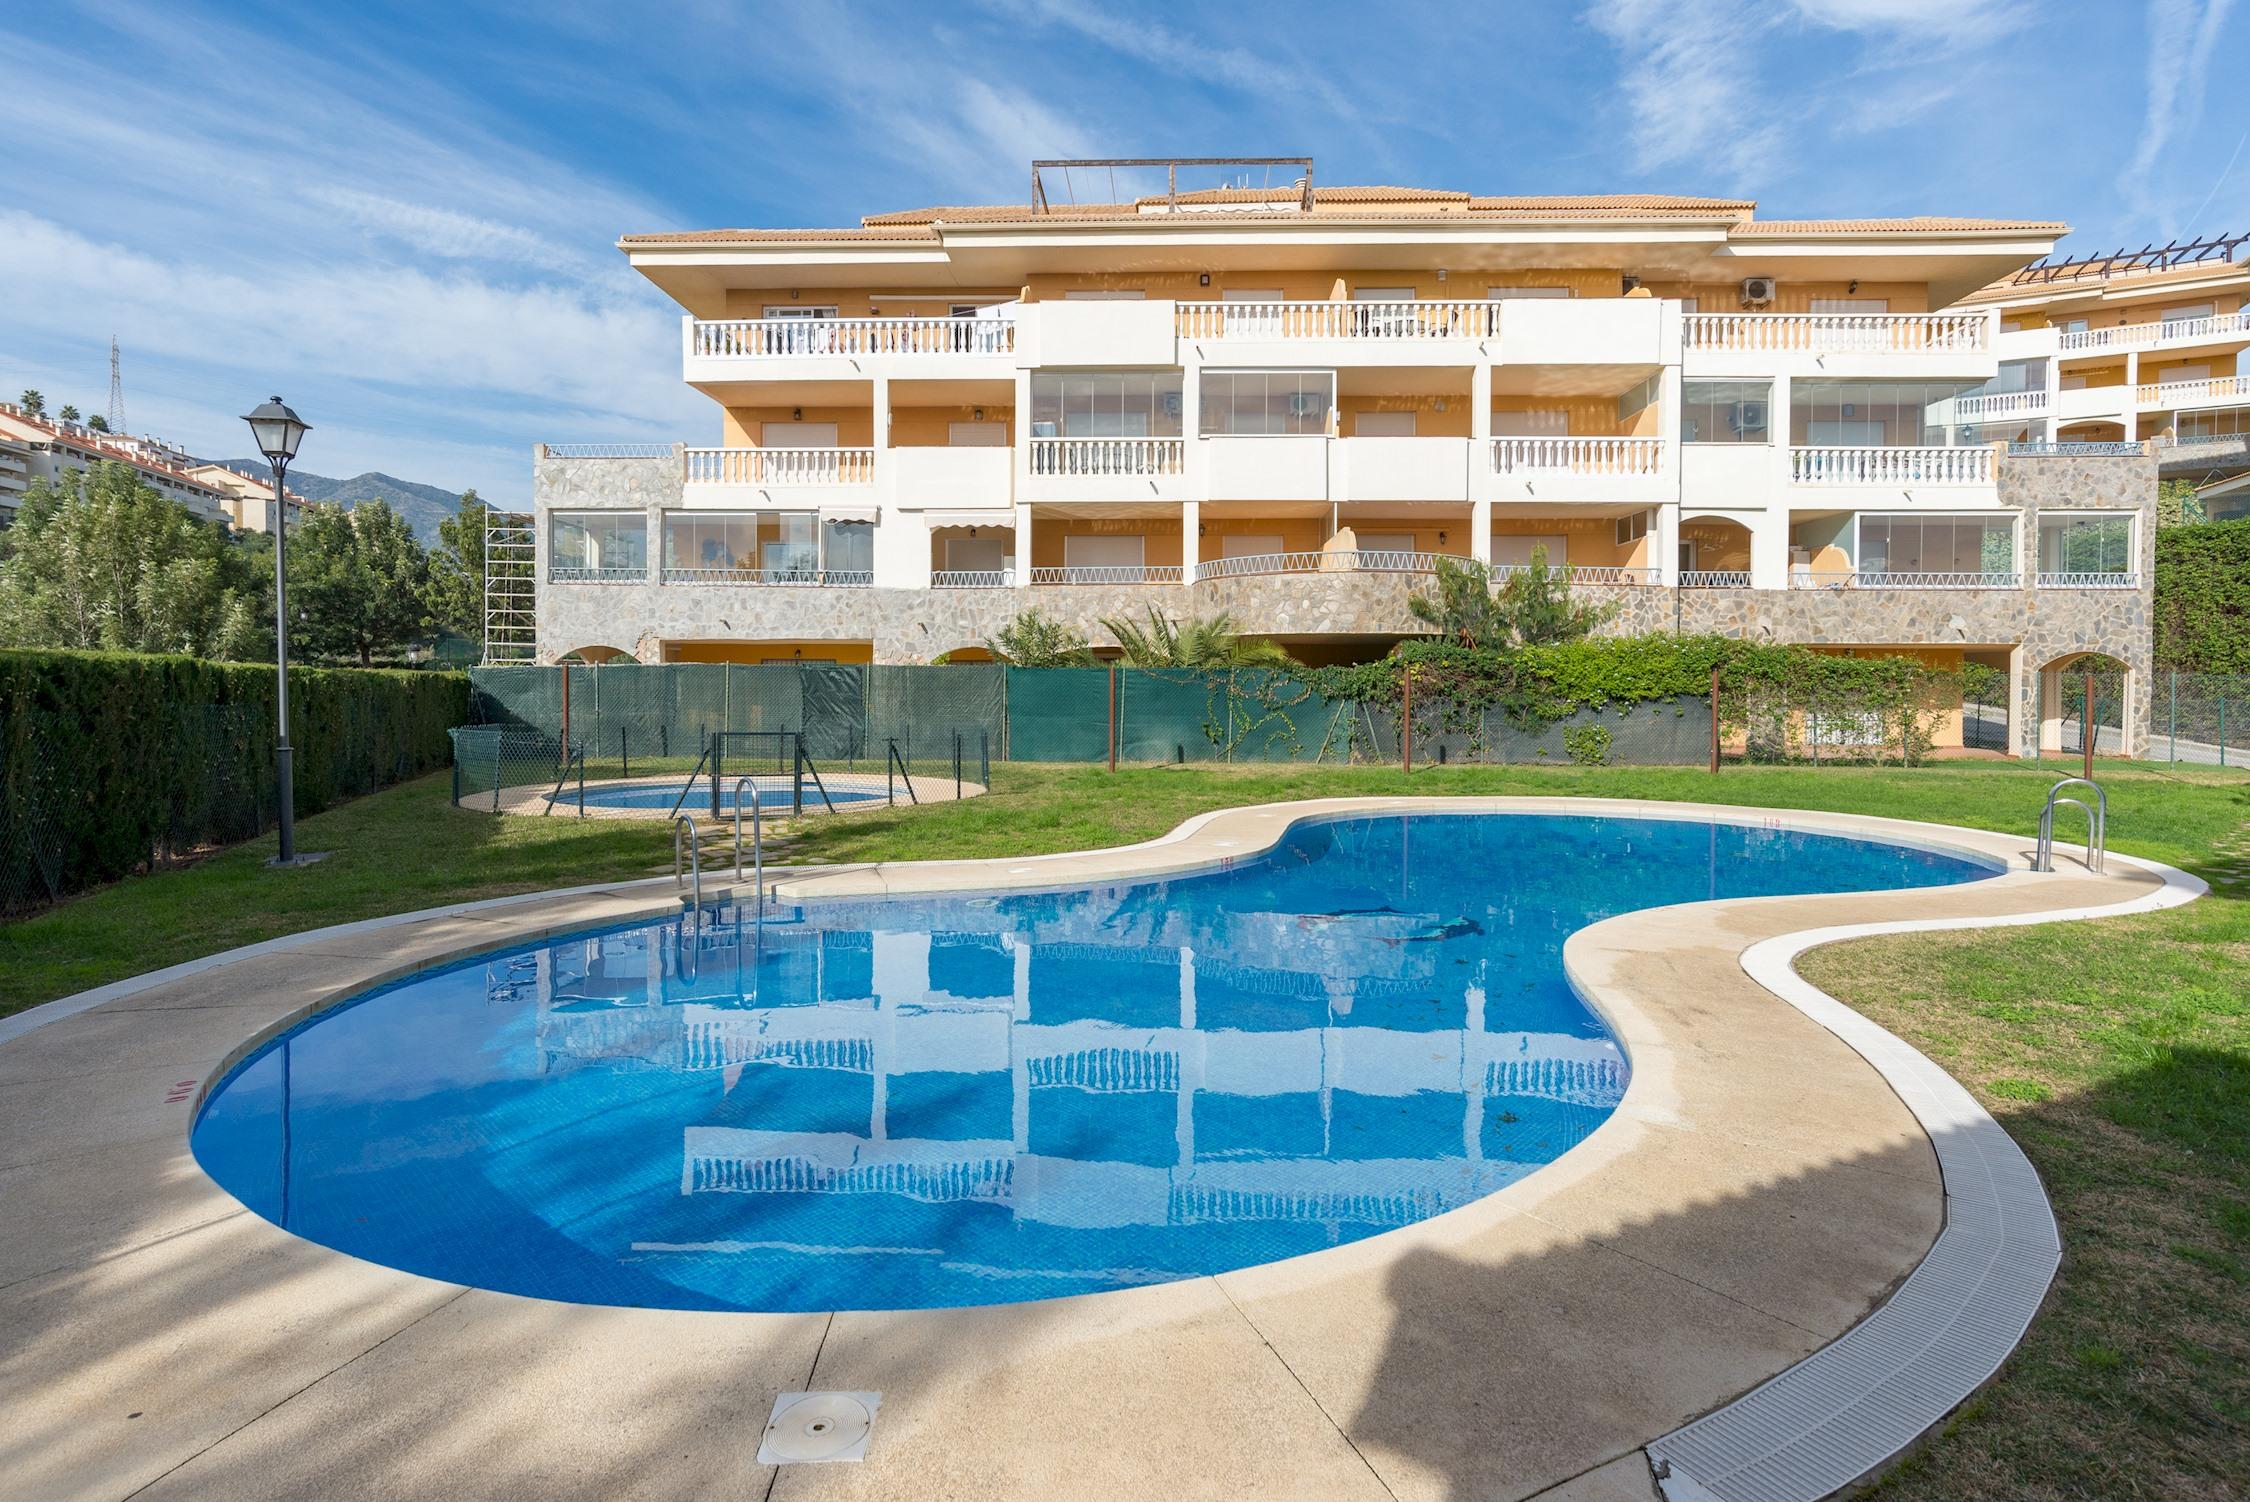 Apartment MalagaSuite Seaview Beach   Pool photo 19416031